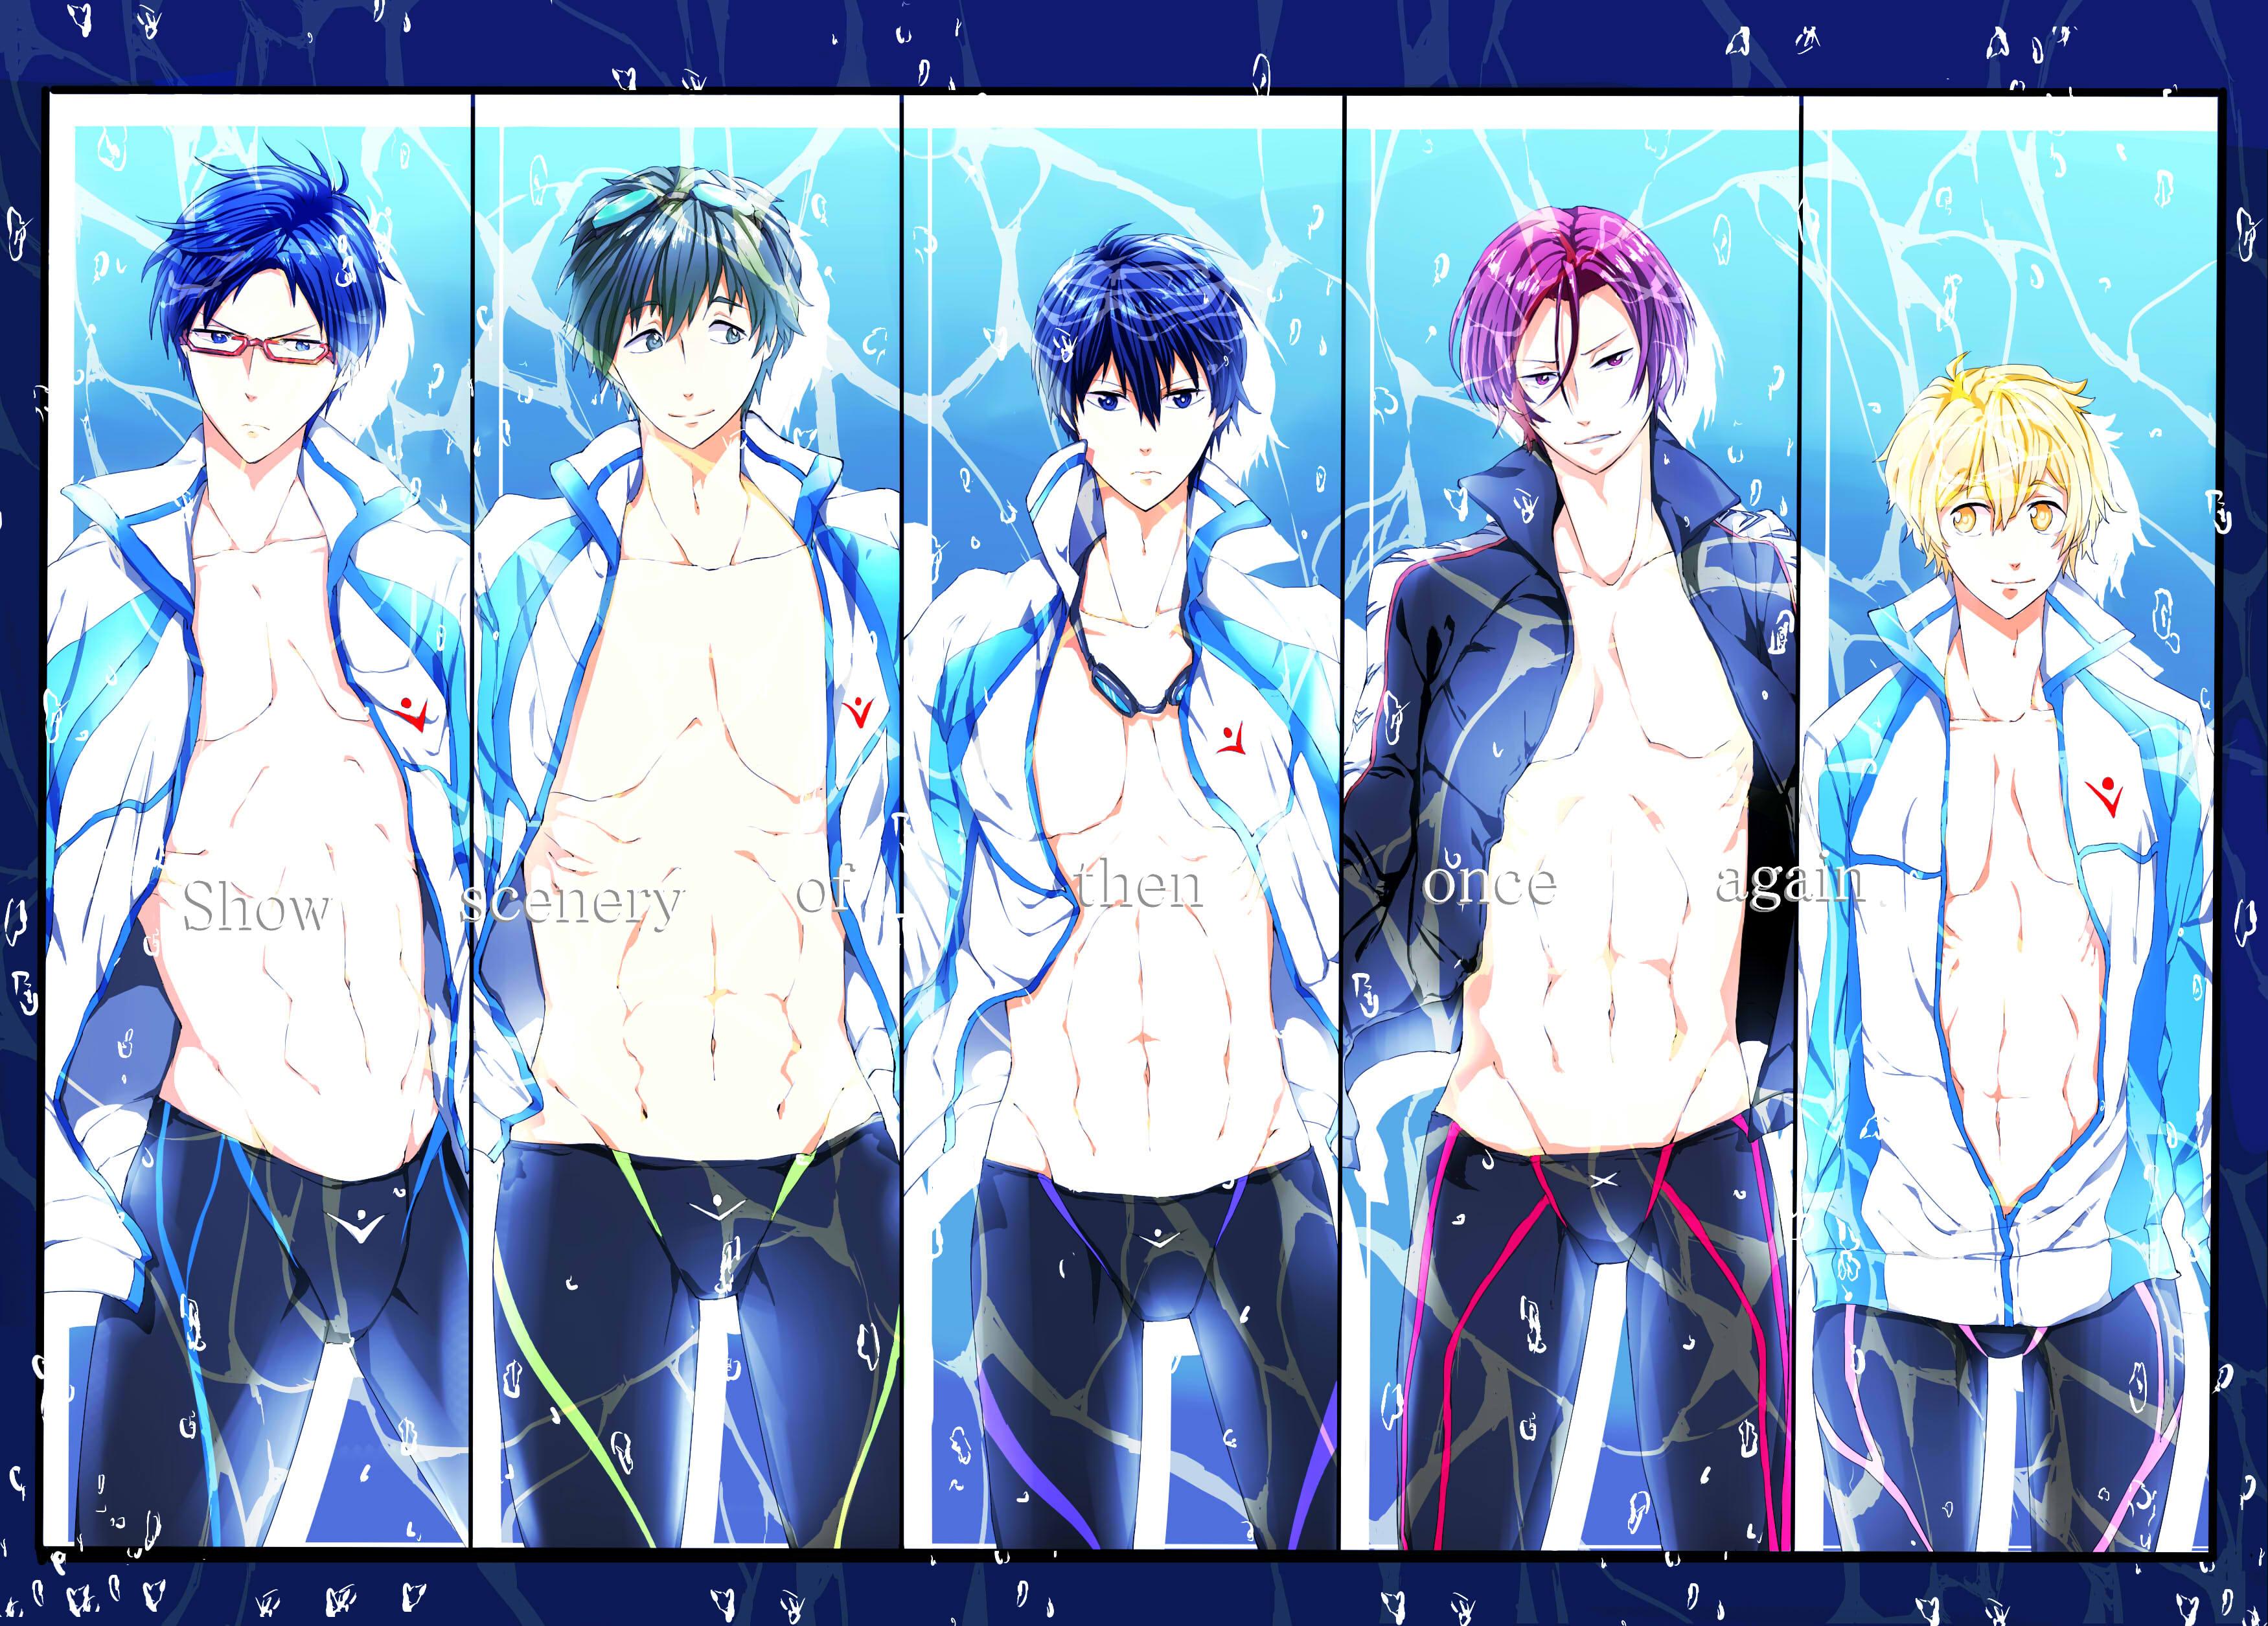 Free! Swimming kyoto Animation Image 1542362